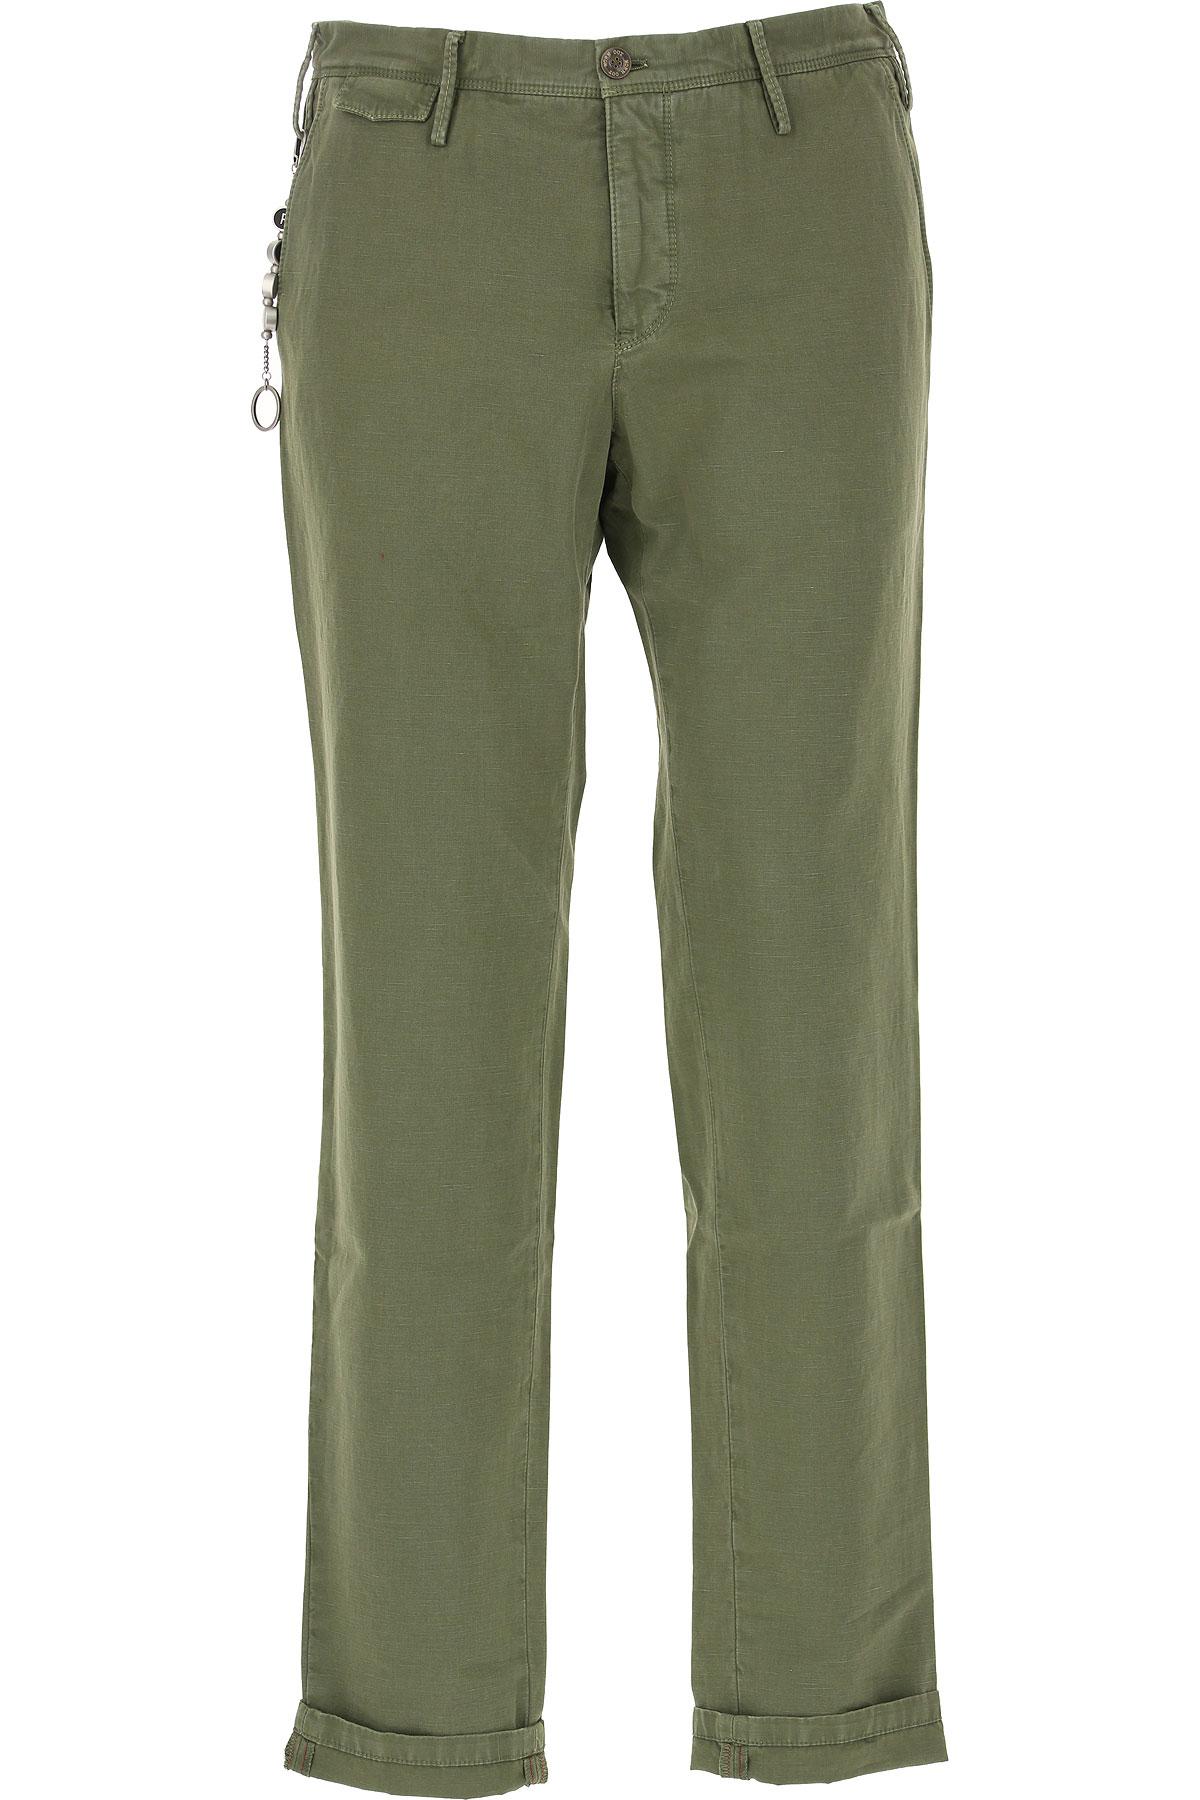 PT01 Pants for Men, Military Green, Cotton, 2019, 31 32 33 34